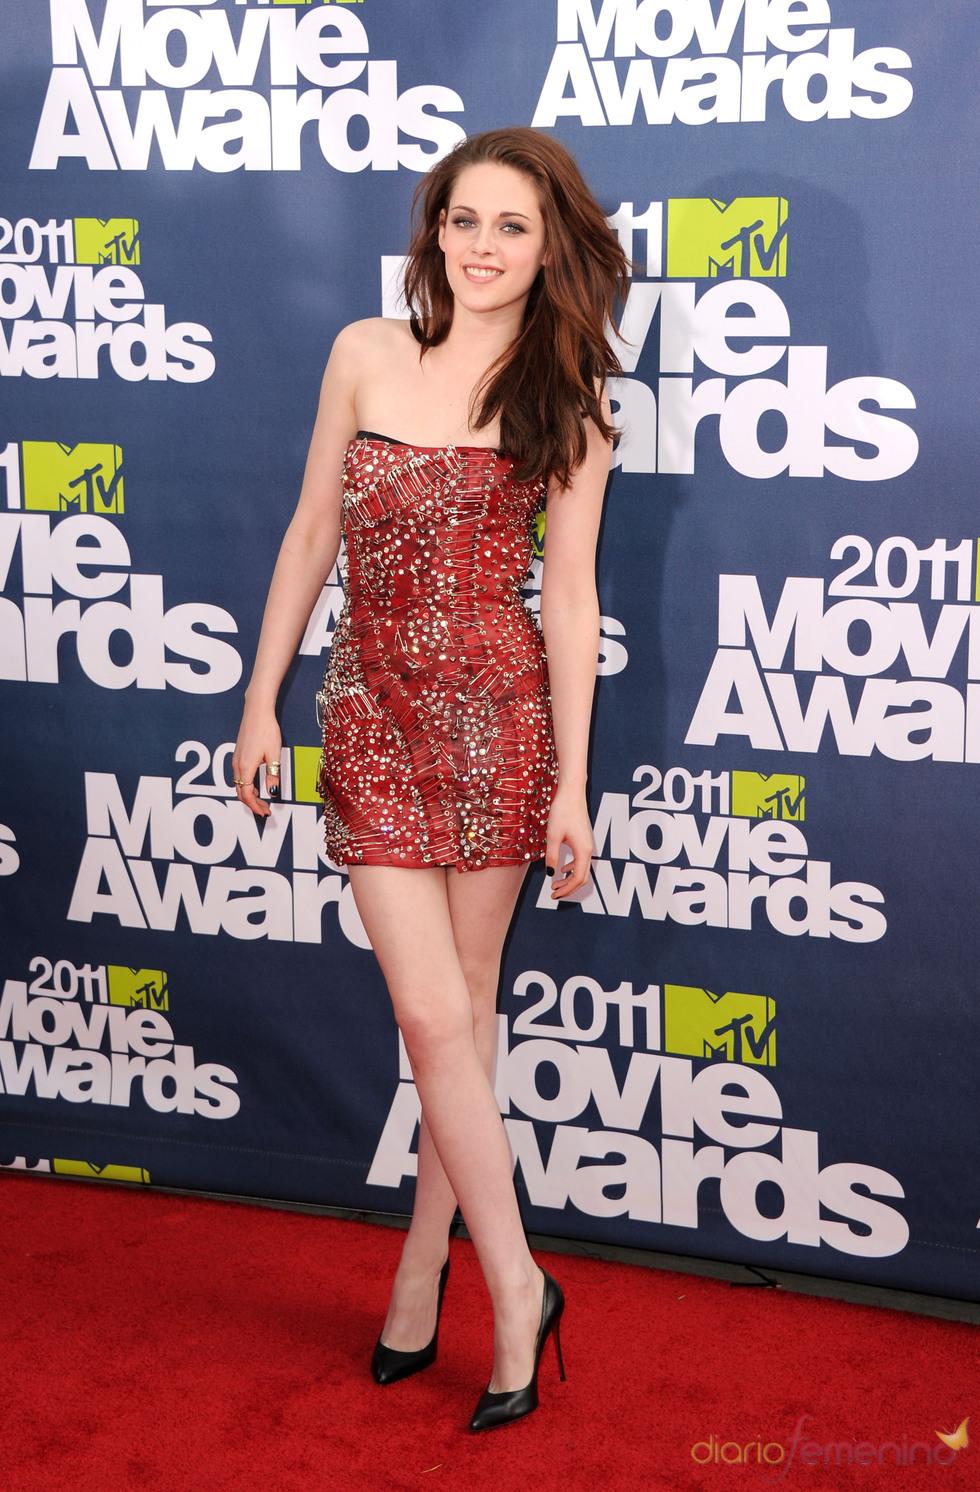 Kristen Stewart a su llegada a los premios MTV Movie Awards 2011